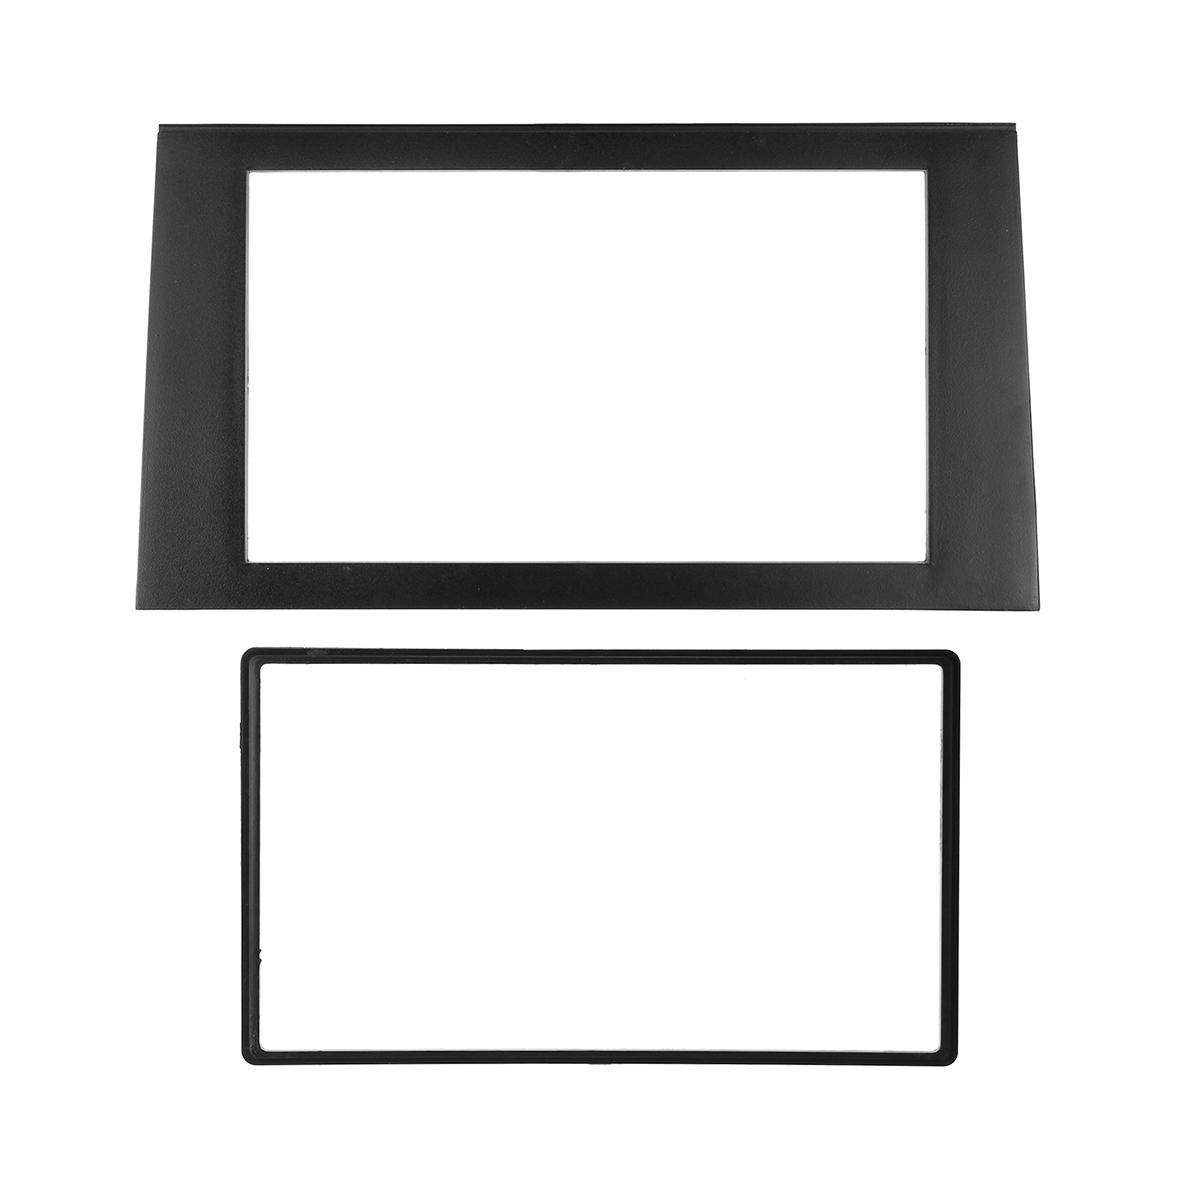 2 DIN Car Stereo Radio Fascia Panel Plate Frame Adaptor CD Trim Dash Mount Kit For 2002-2008 Audi A4 B7//2002-2006 Audi